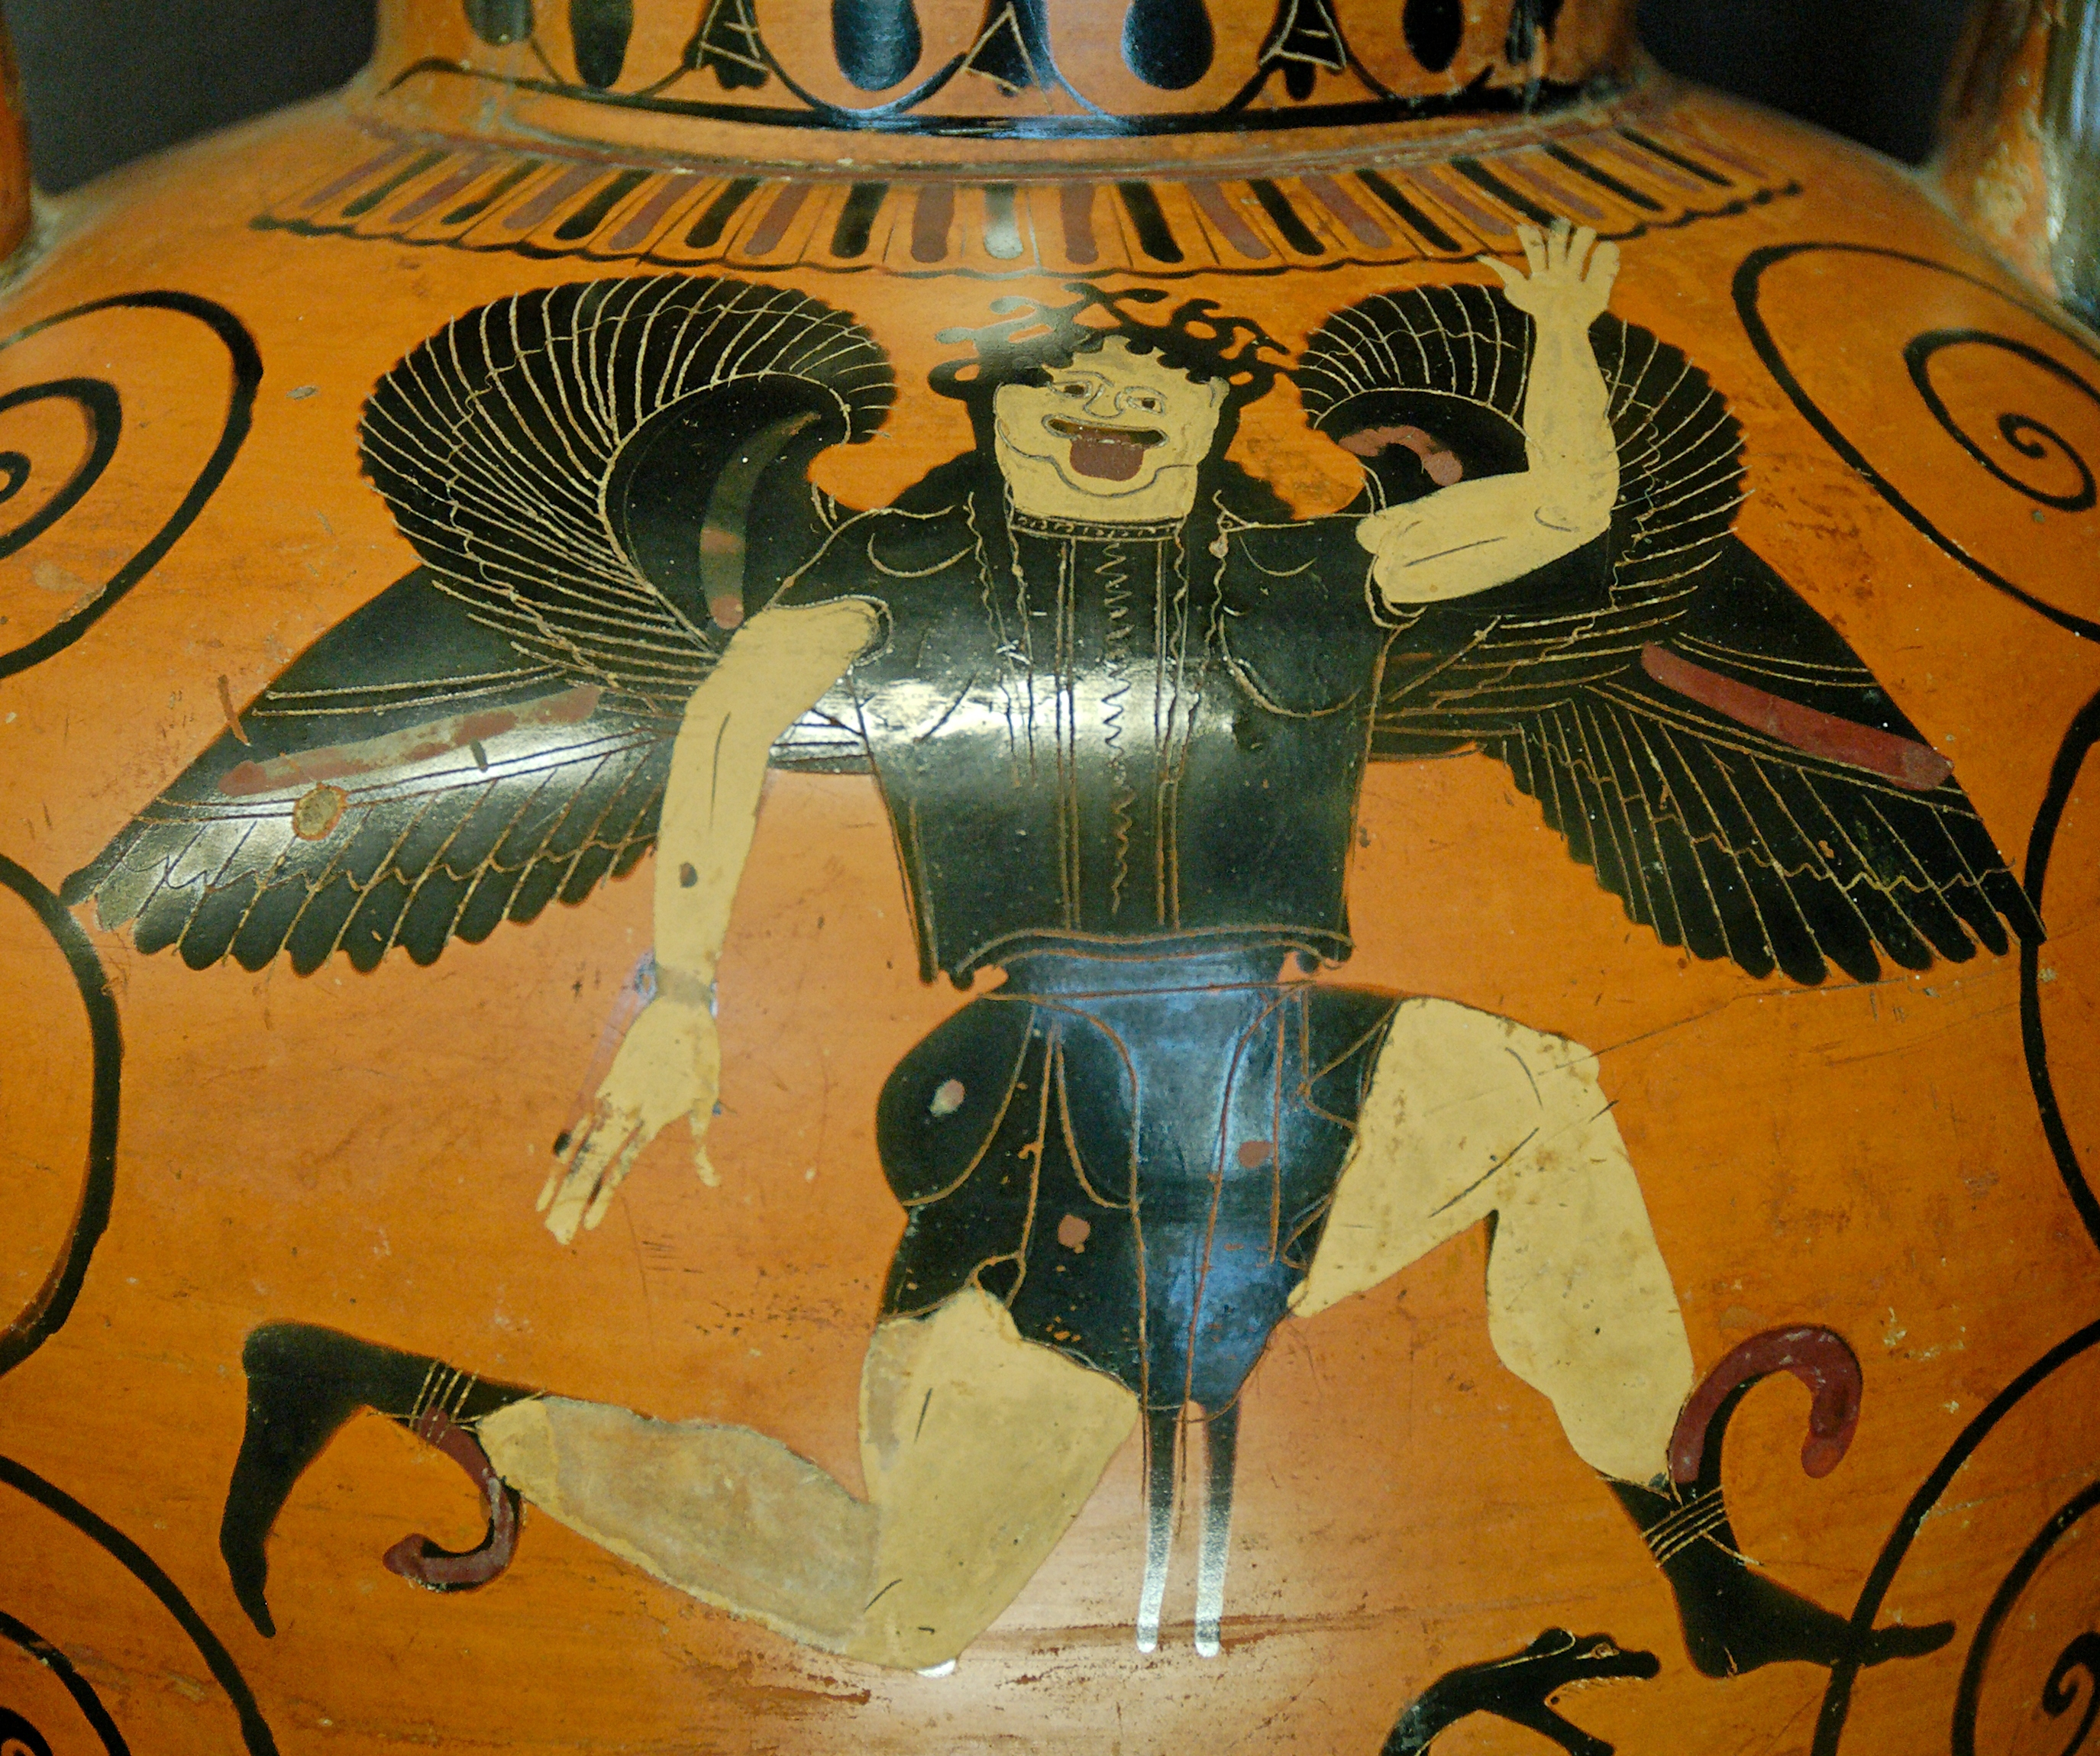 https://upload.wikimedia.org/wikipedia/commons/c/c0/Gorgon_Louvre_F230.jpg